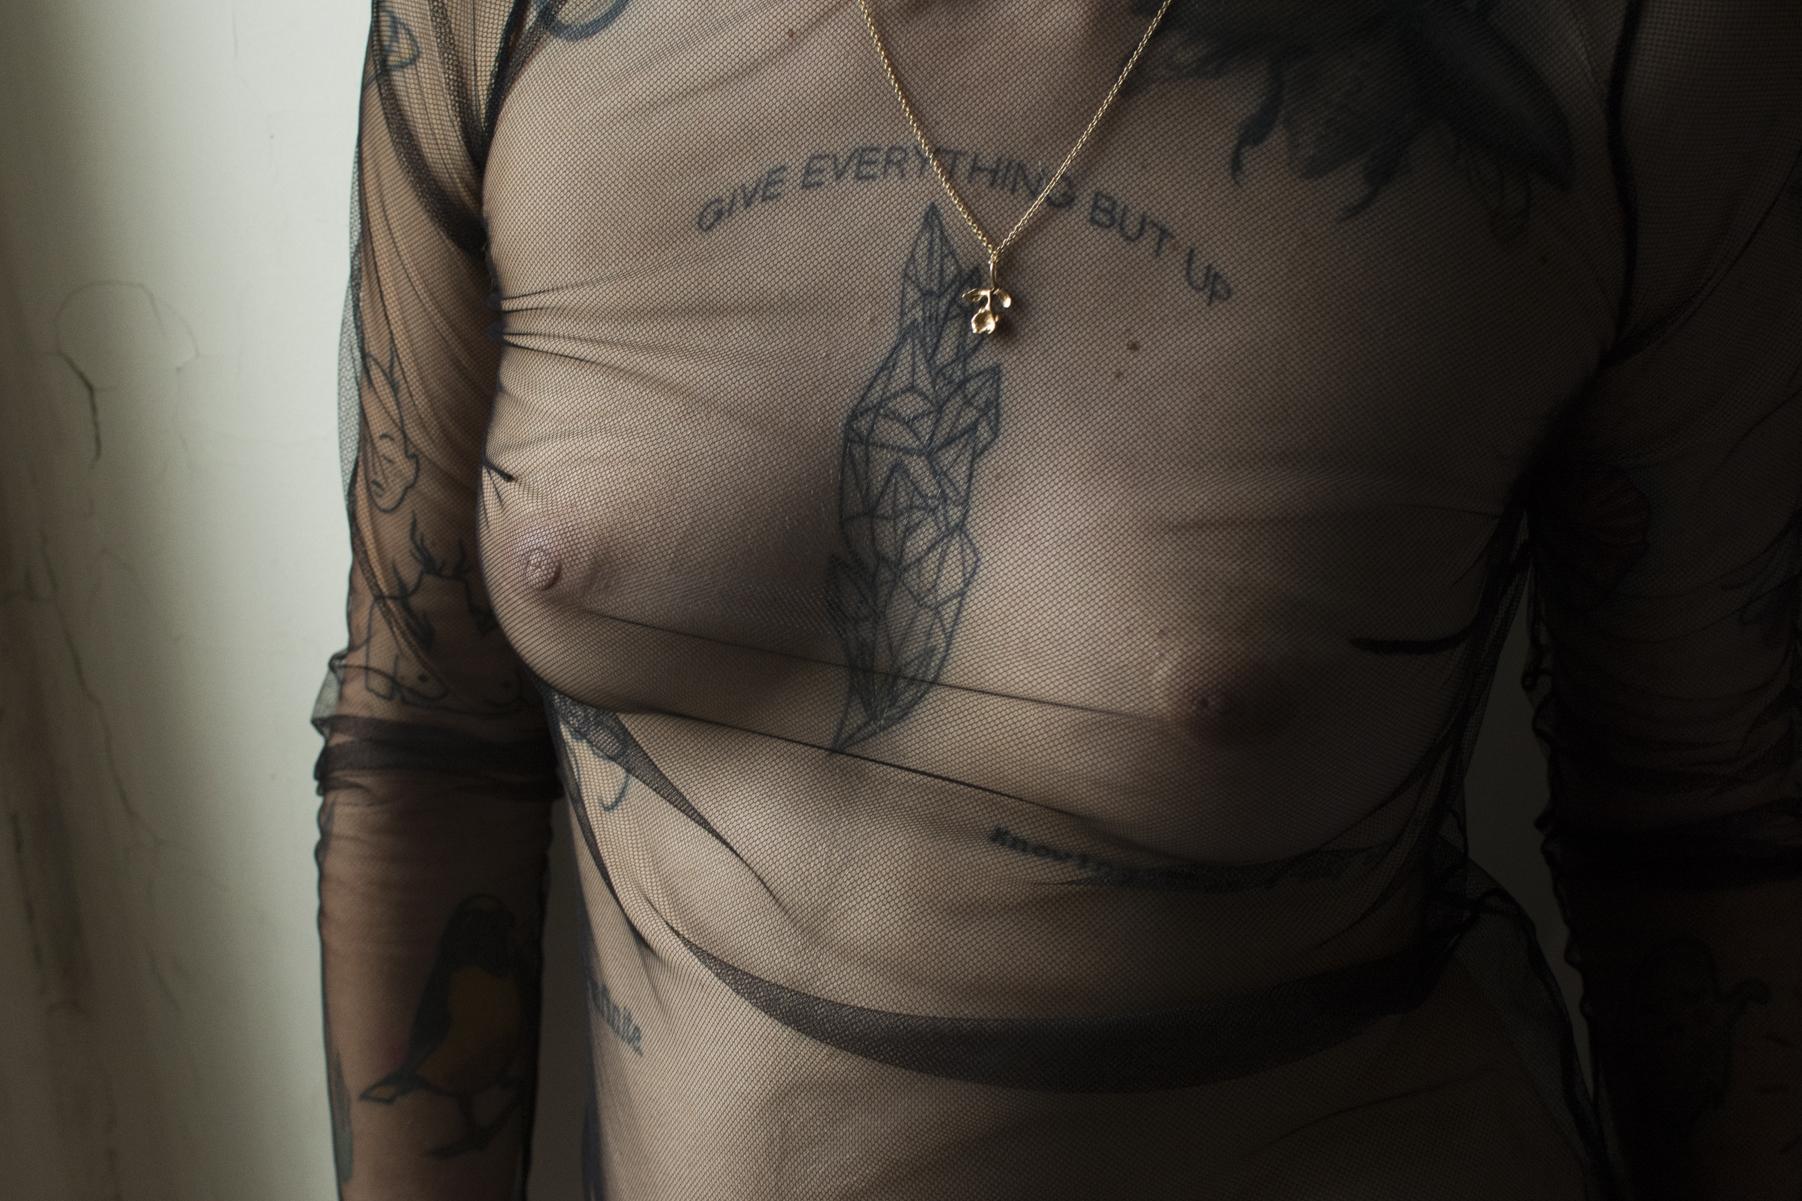 murmur clothing choker teddy gold straps_21.JPG